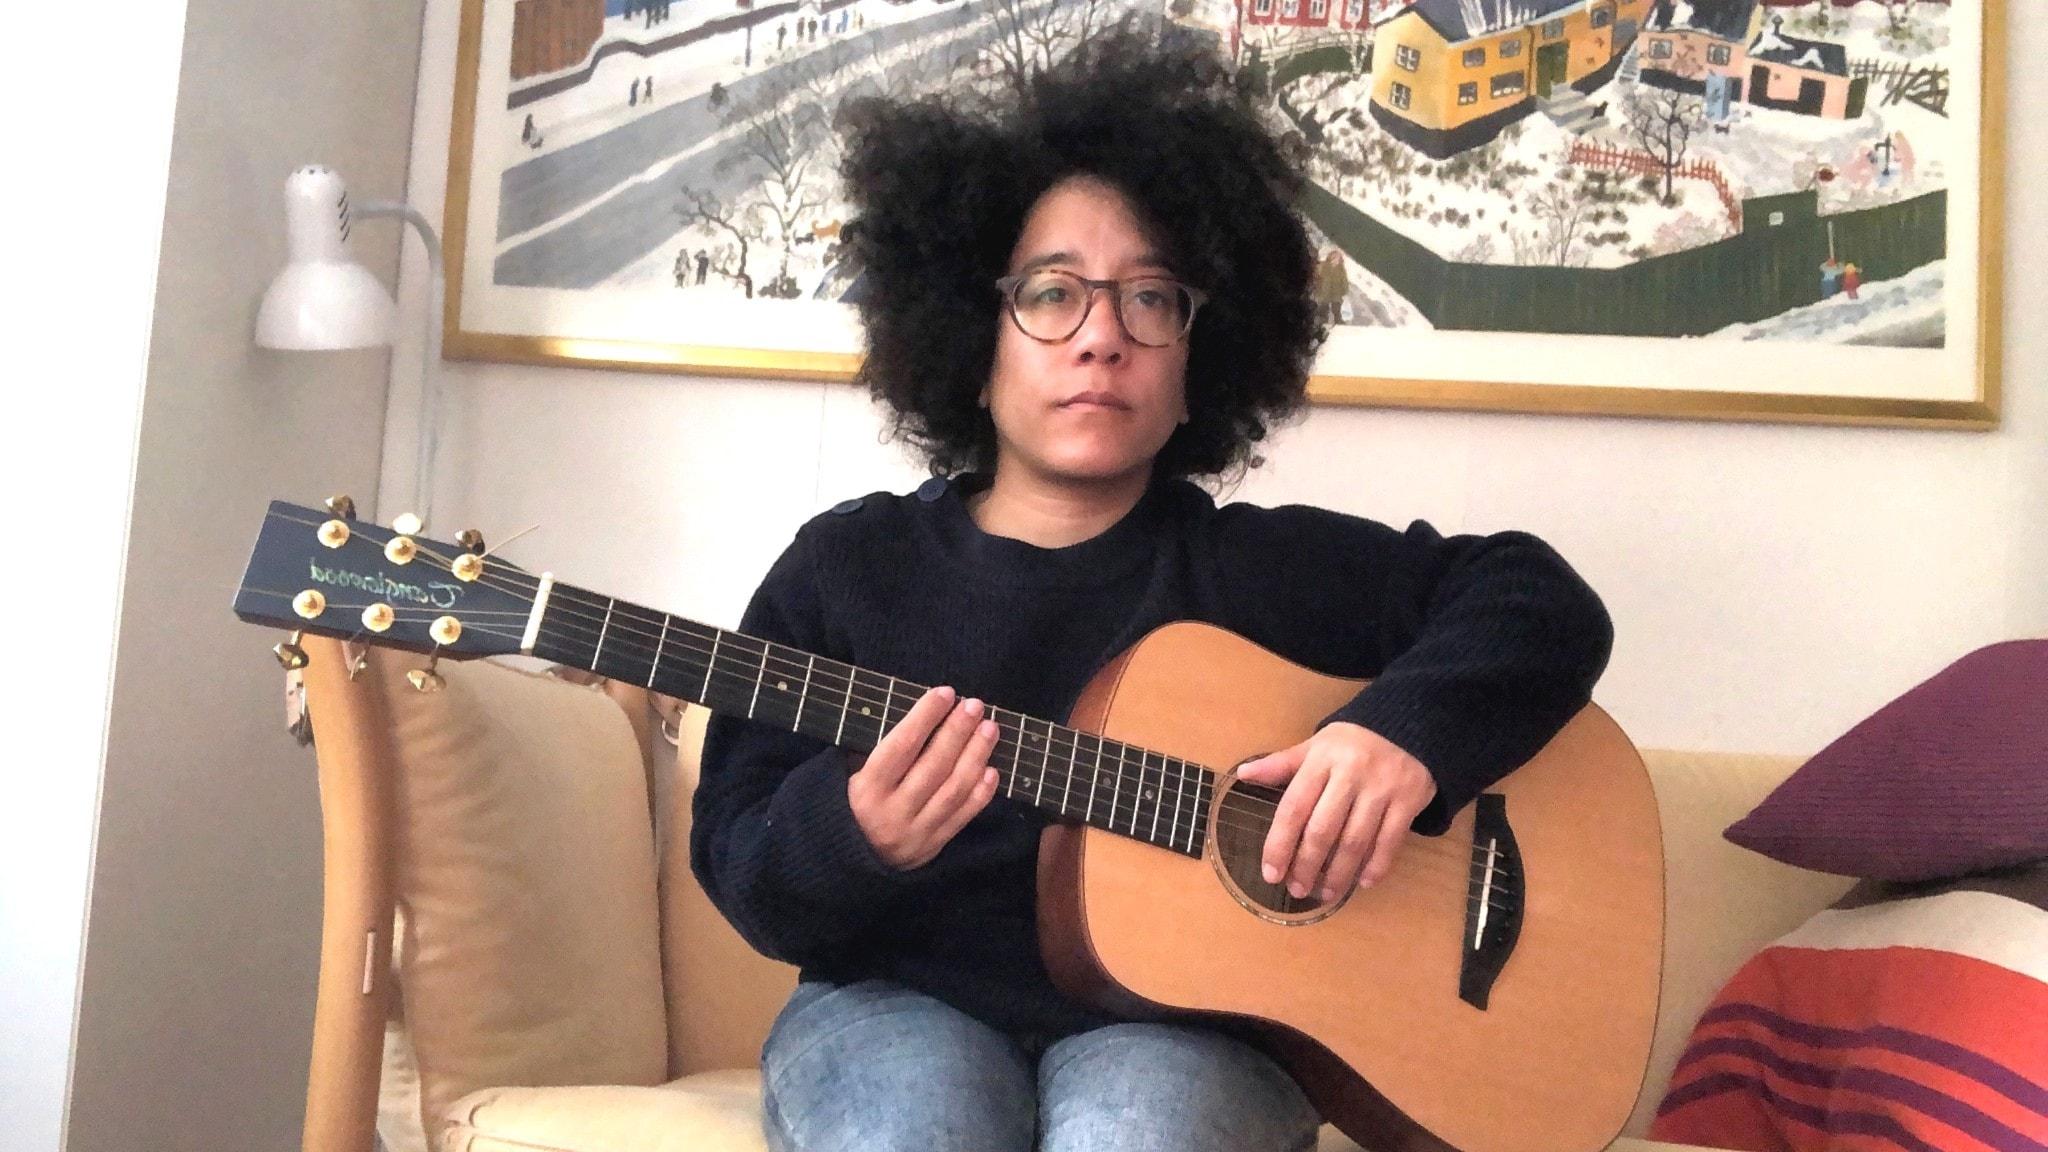 Catrine Lundell sitter i en soffa med en gitarr, allvarlig min.